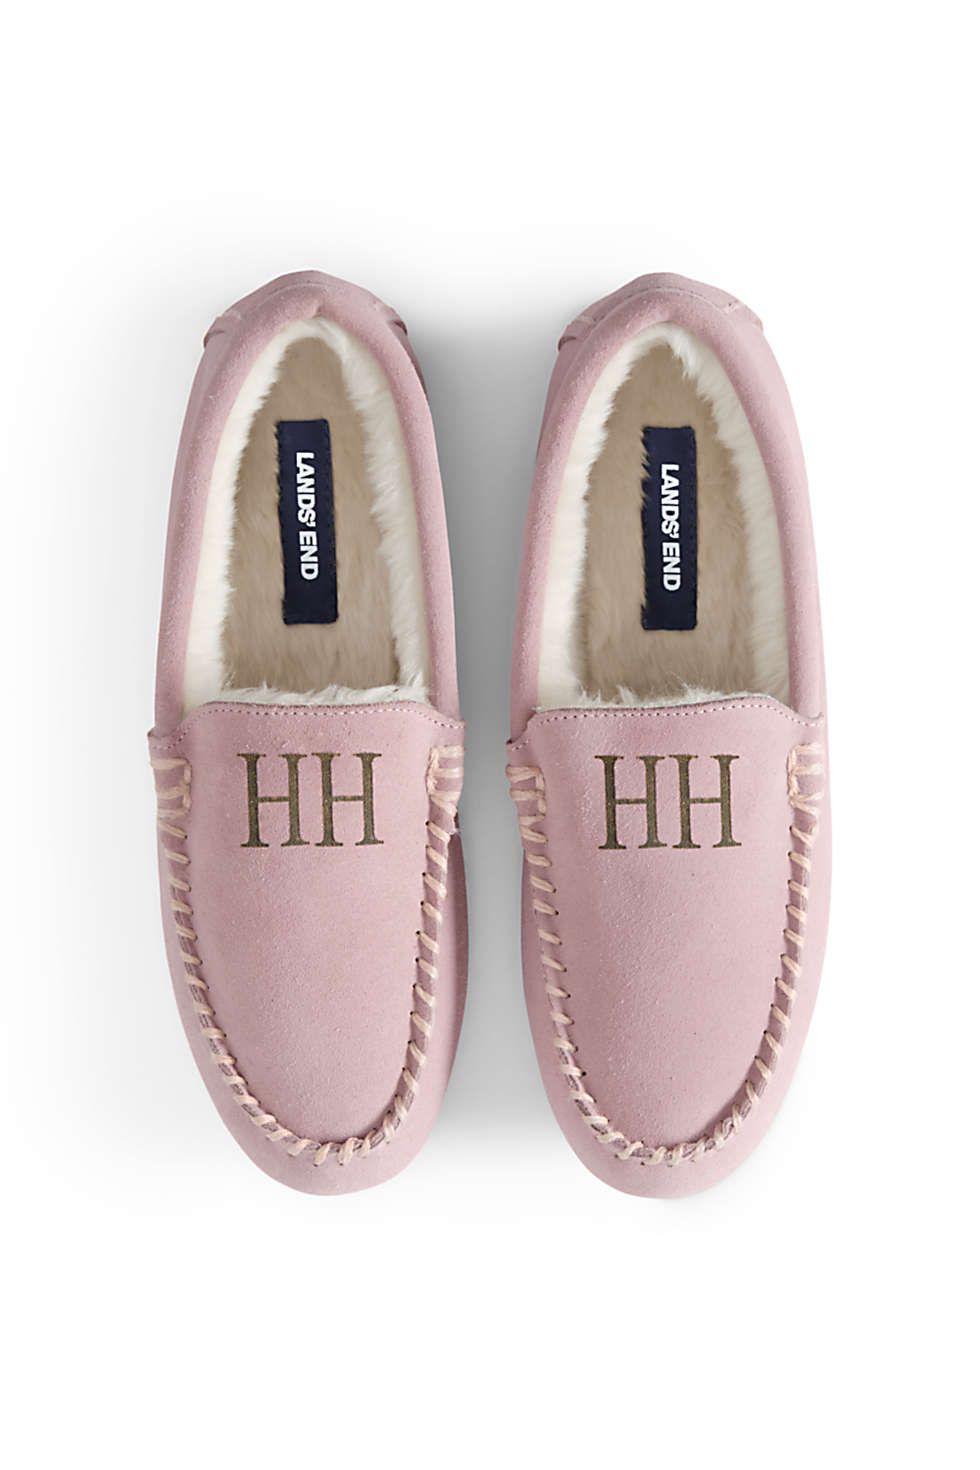 mocassin slippers